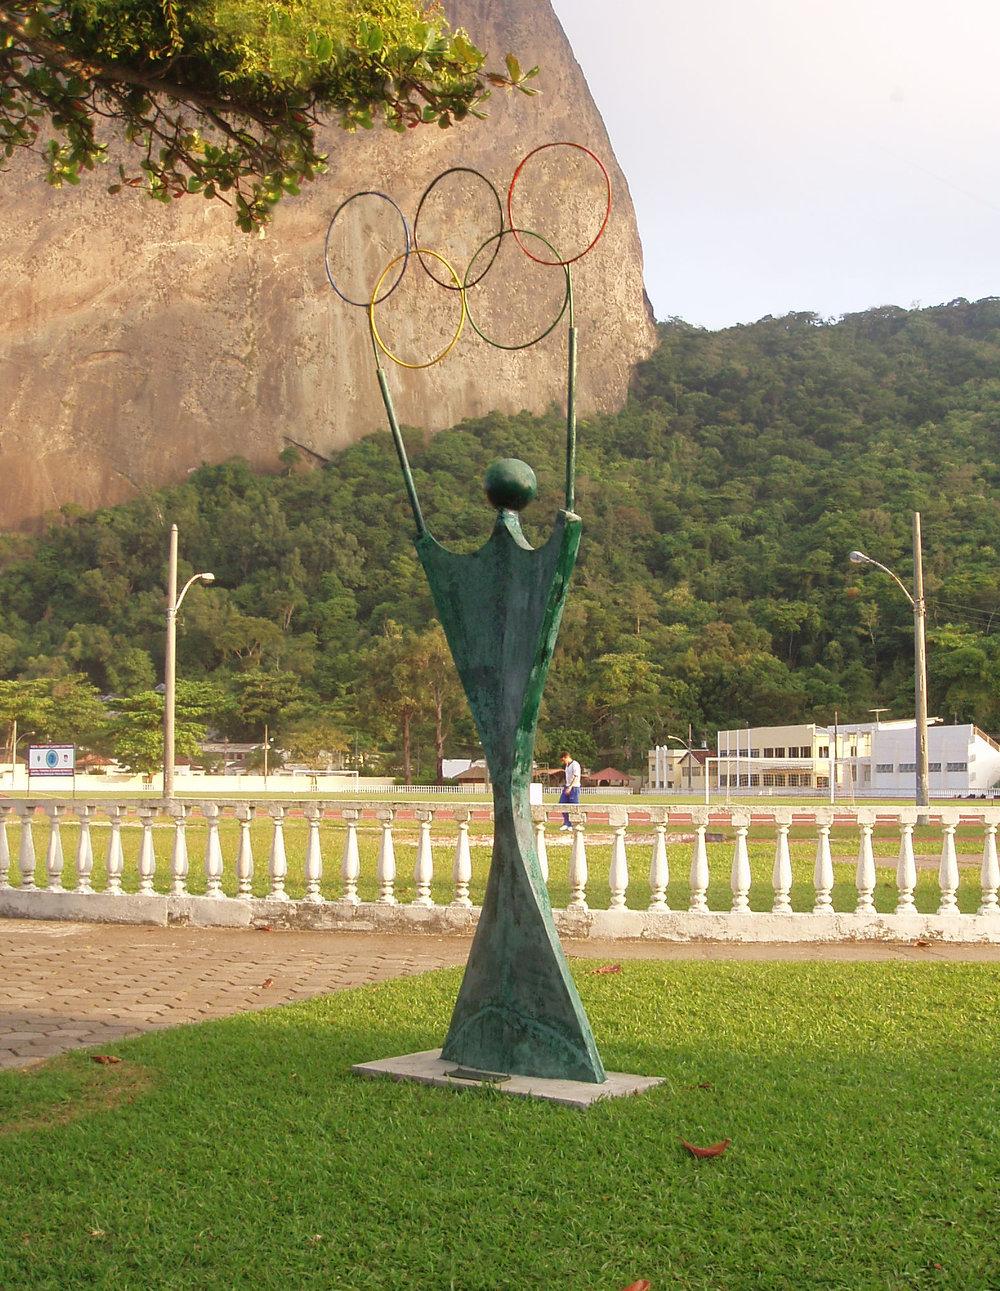 Olimpíada / Olympic